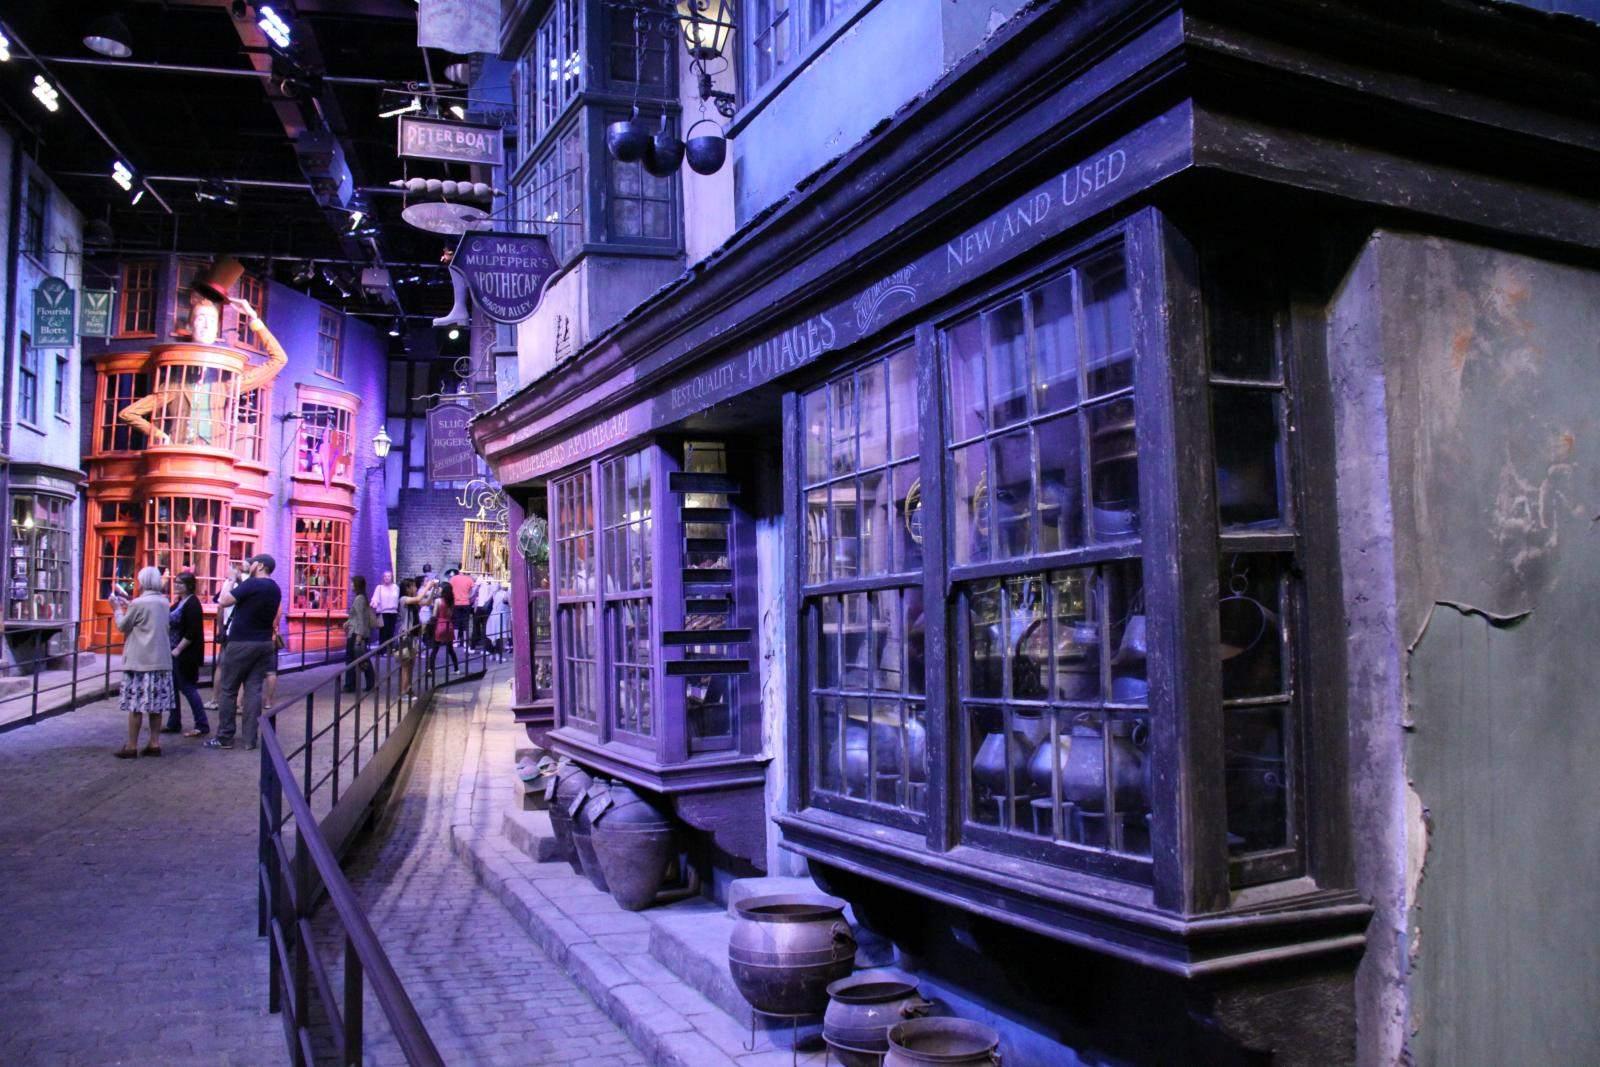 making harry potter1 The Making of Harry Potter, Warner Bros Studio London